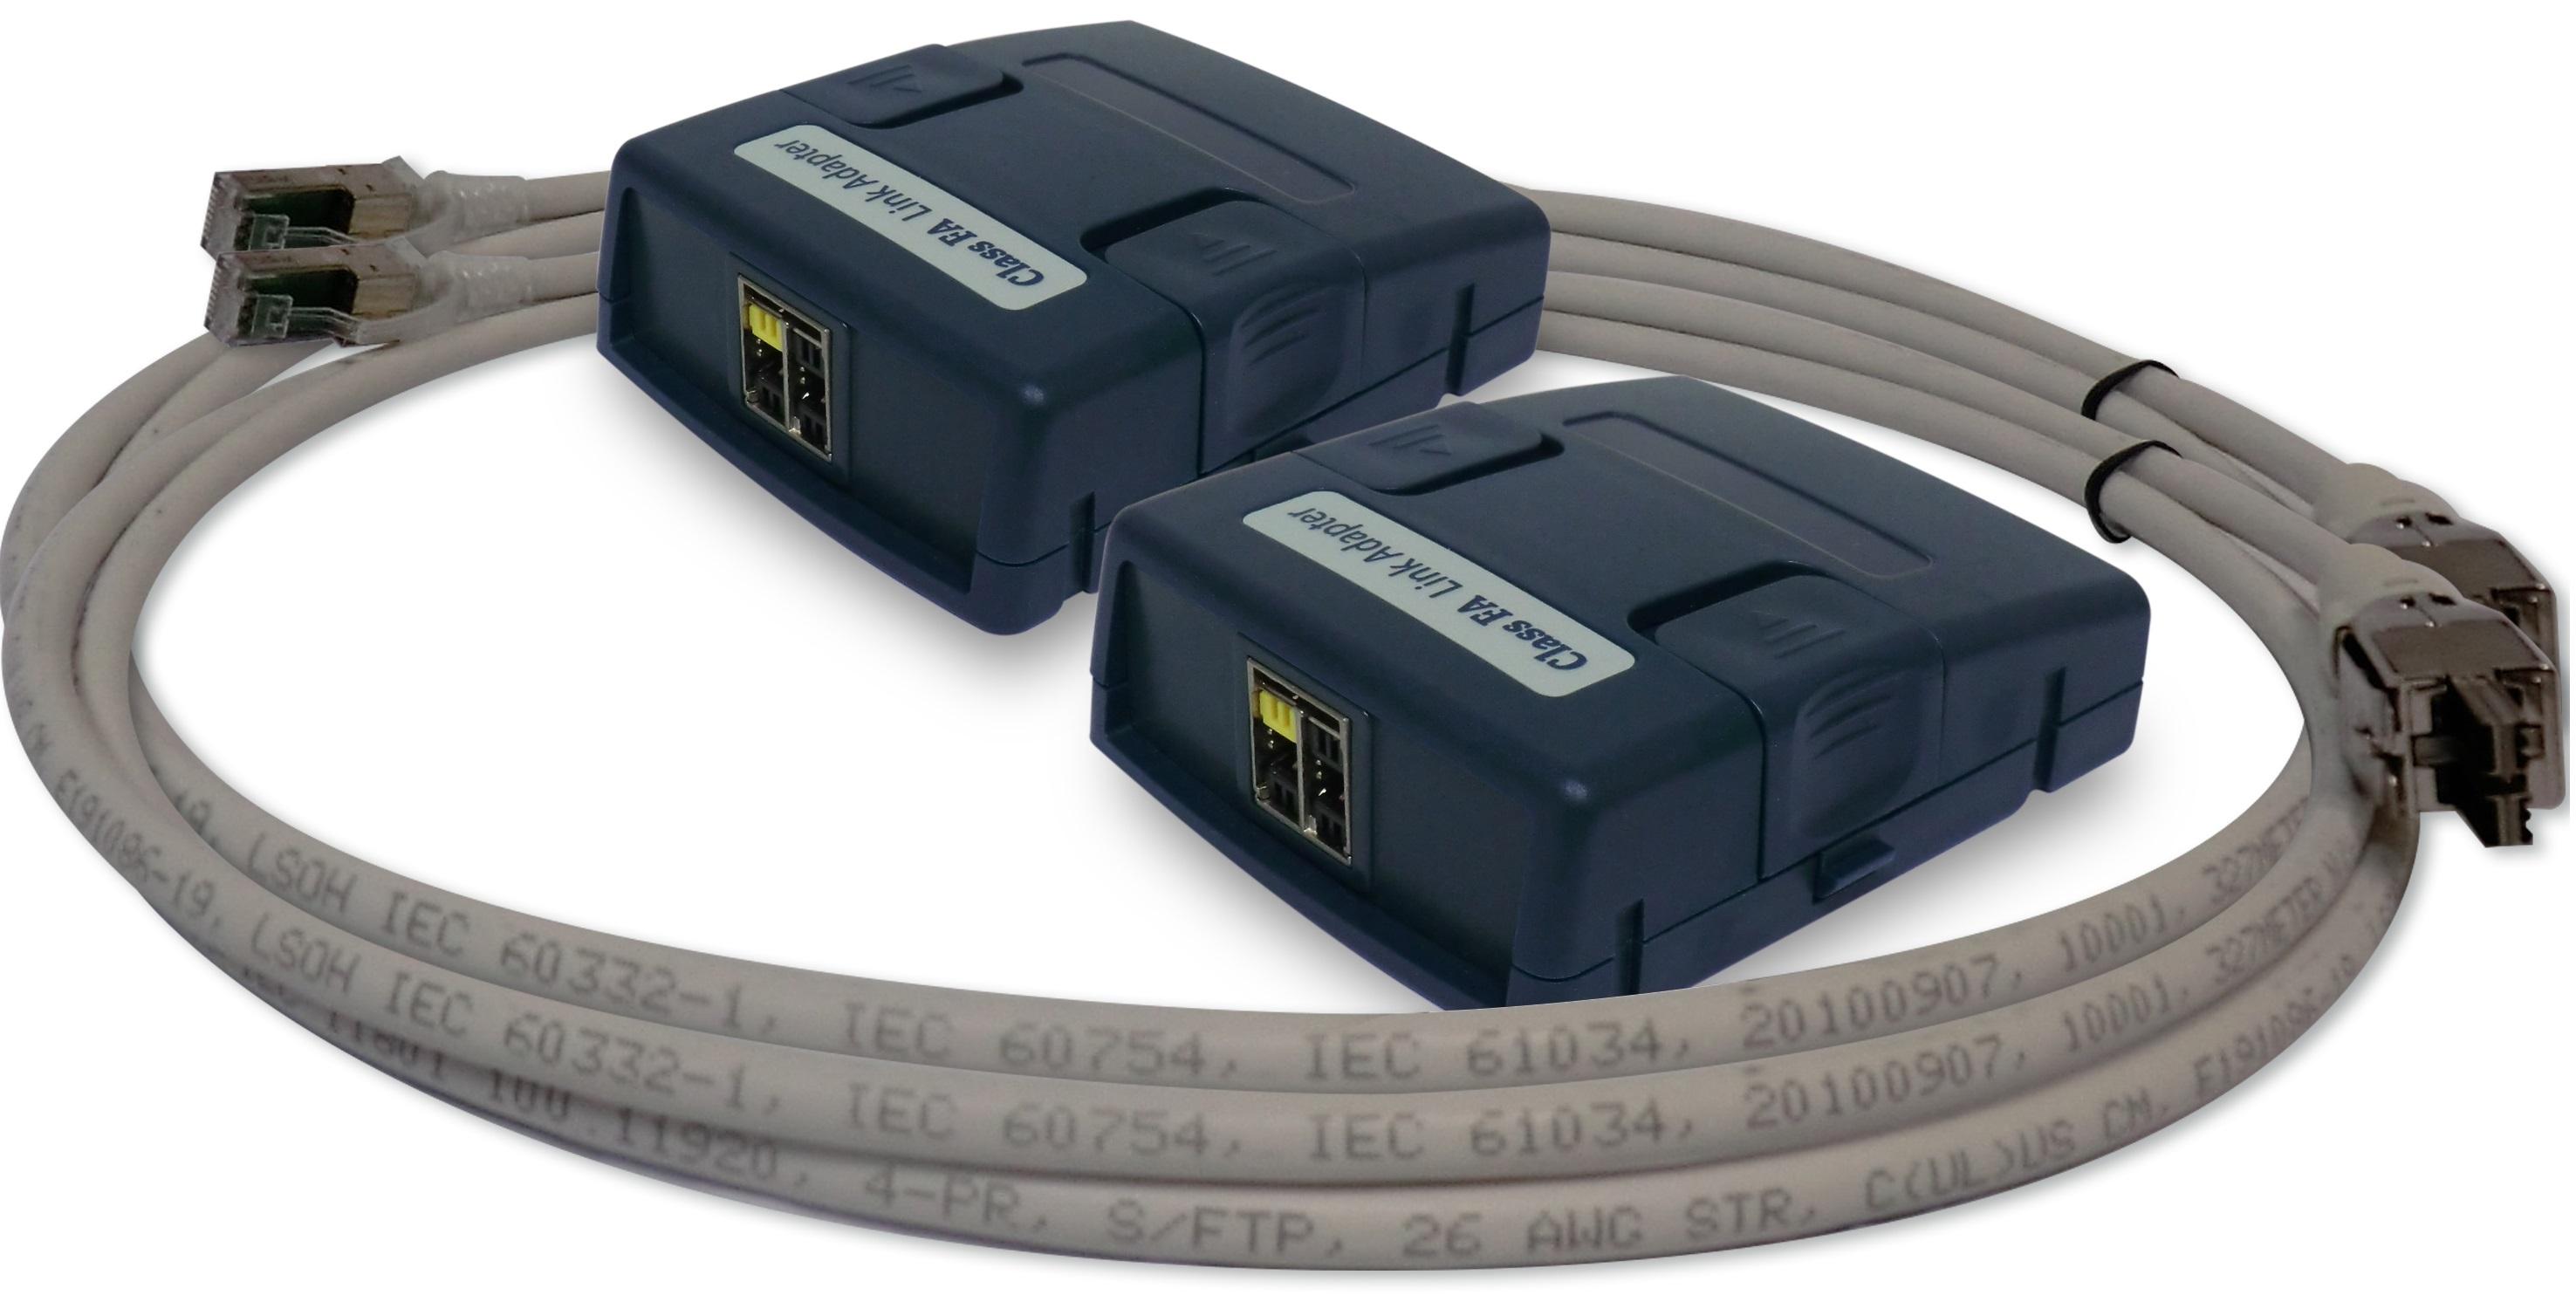 1 Stk WireXpert TERA Permanent Link Adapter-Set - Klasse Fa/Kat.7a HMSWXZPLT-